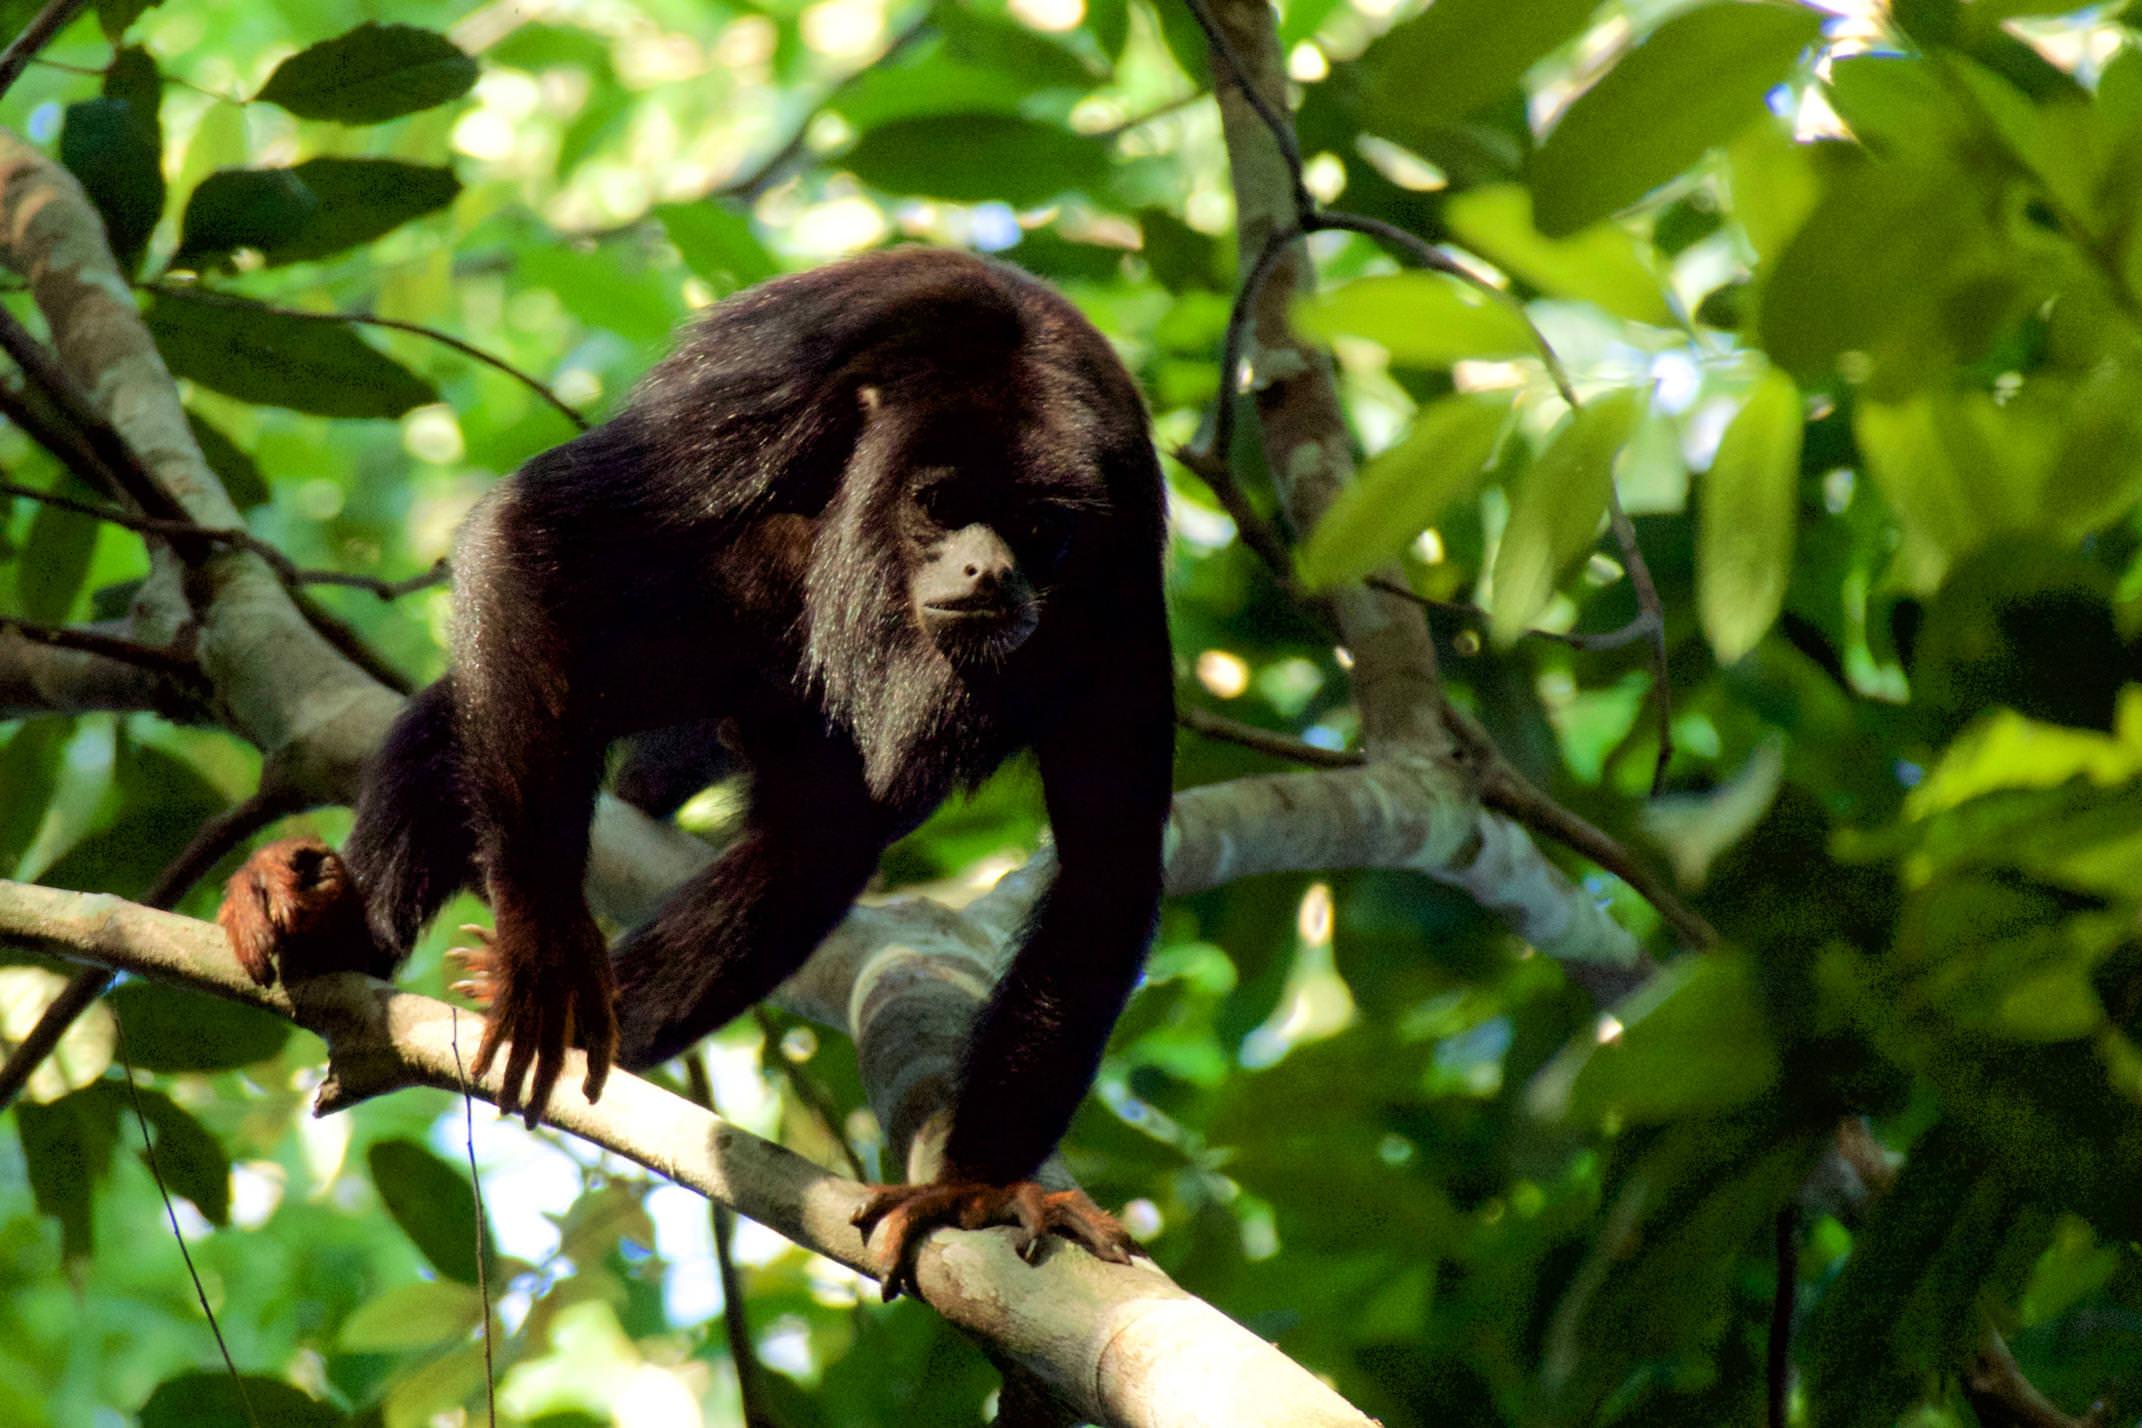 Brazil amazon cristalino lodge red handed howler monkey copyright thomas power pura aventura